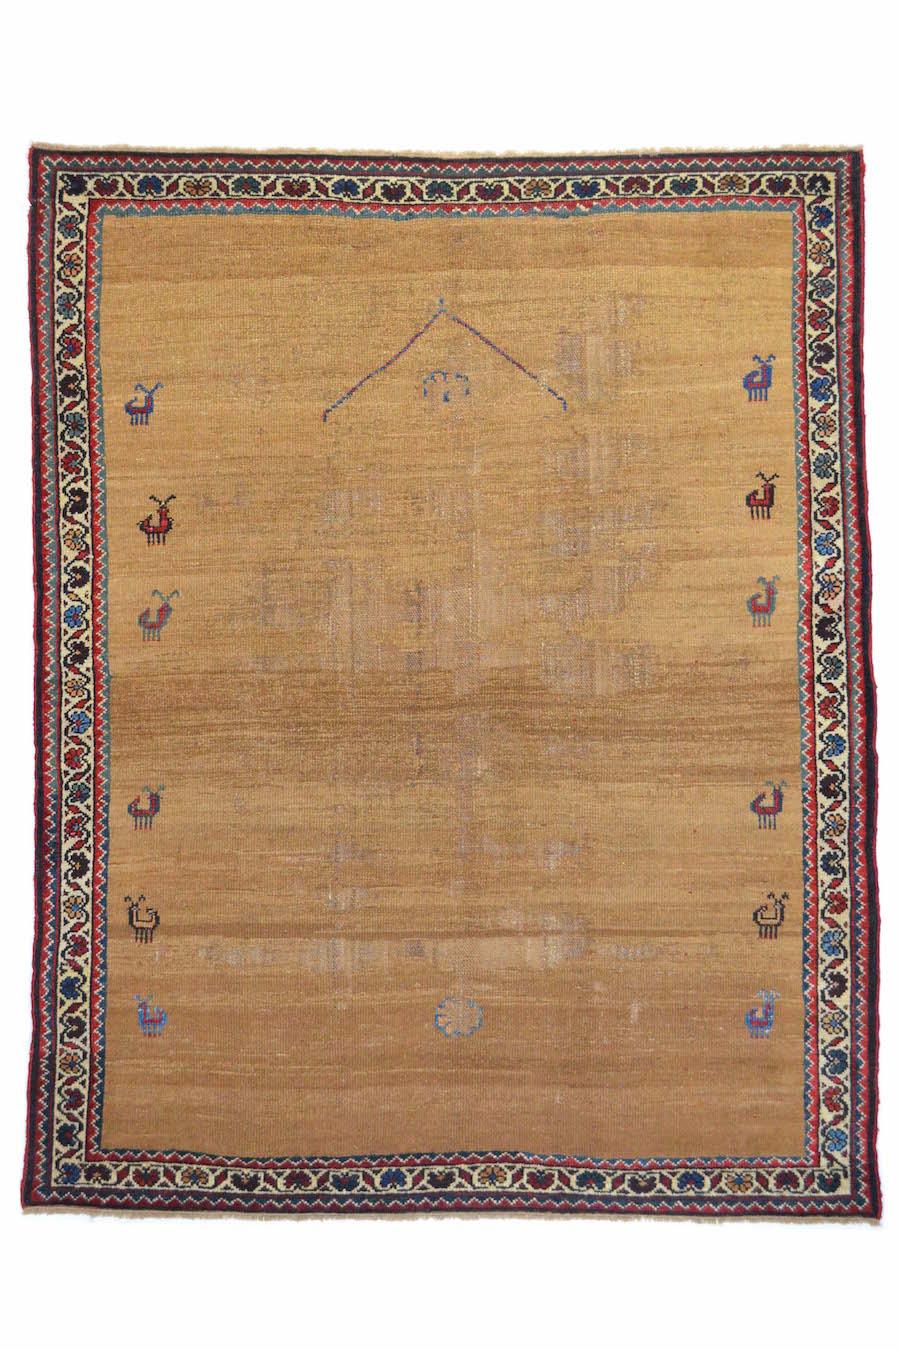 Northwest Persian prayer rug